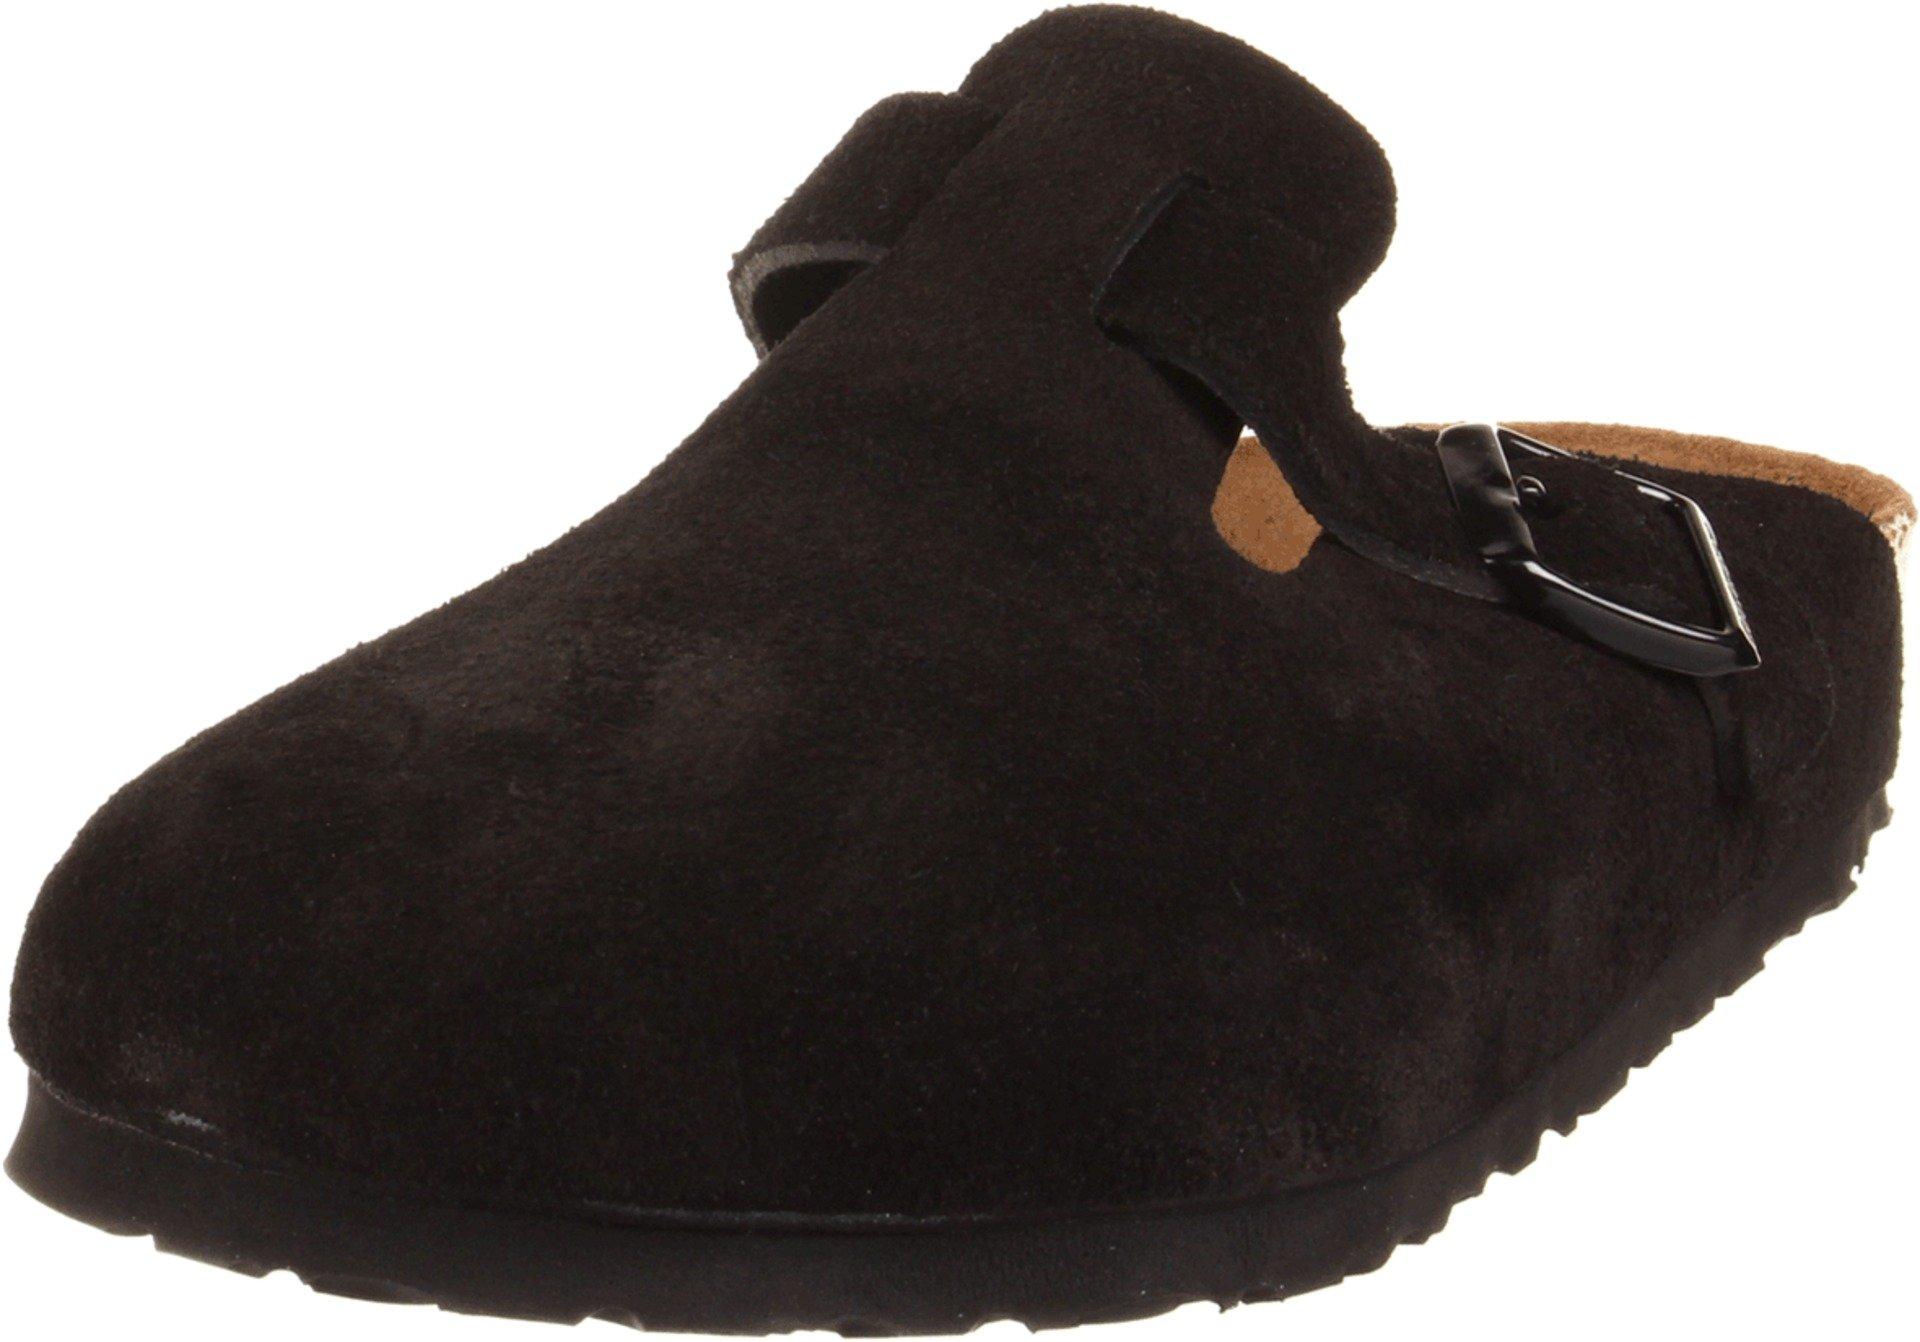 Birkenstock Boston Soft Footbed (Unisex), Black Suede, 38 M EU